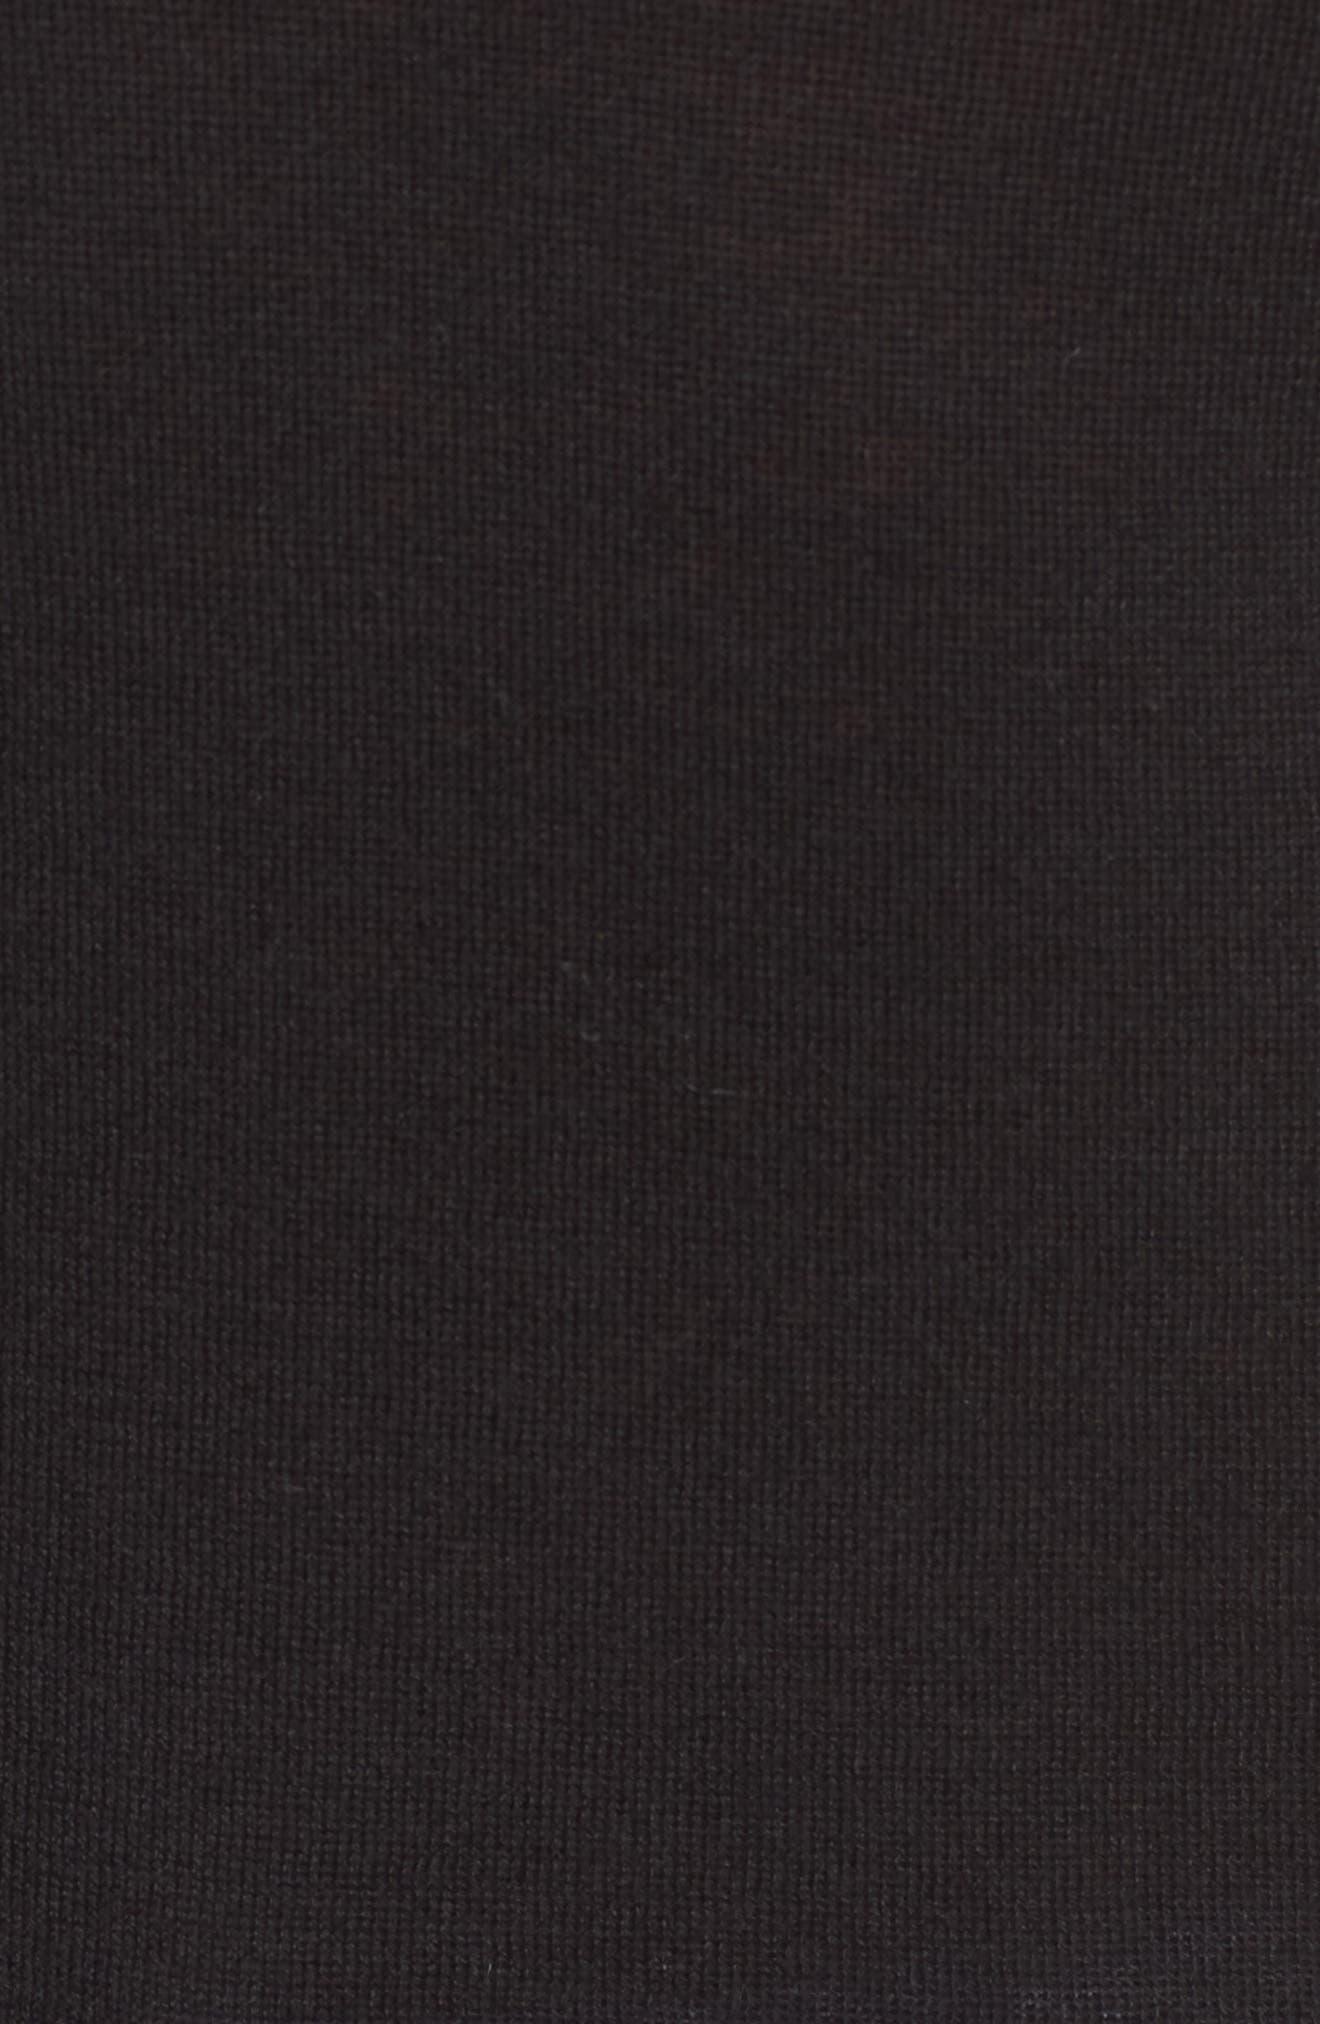 Cotton Blend Pullover,                             Alternate thumbnail 5, color,                             Black